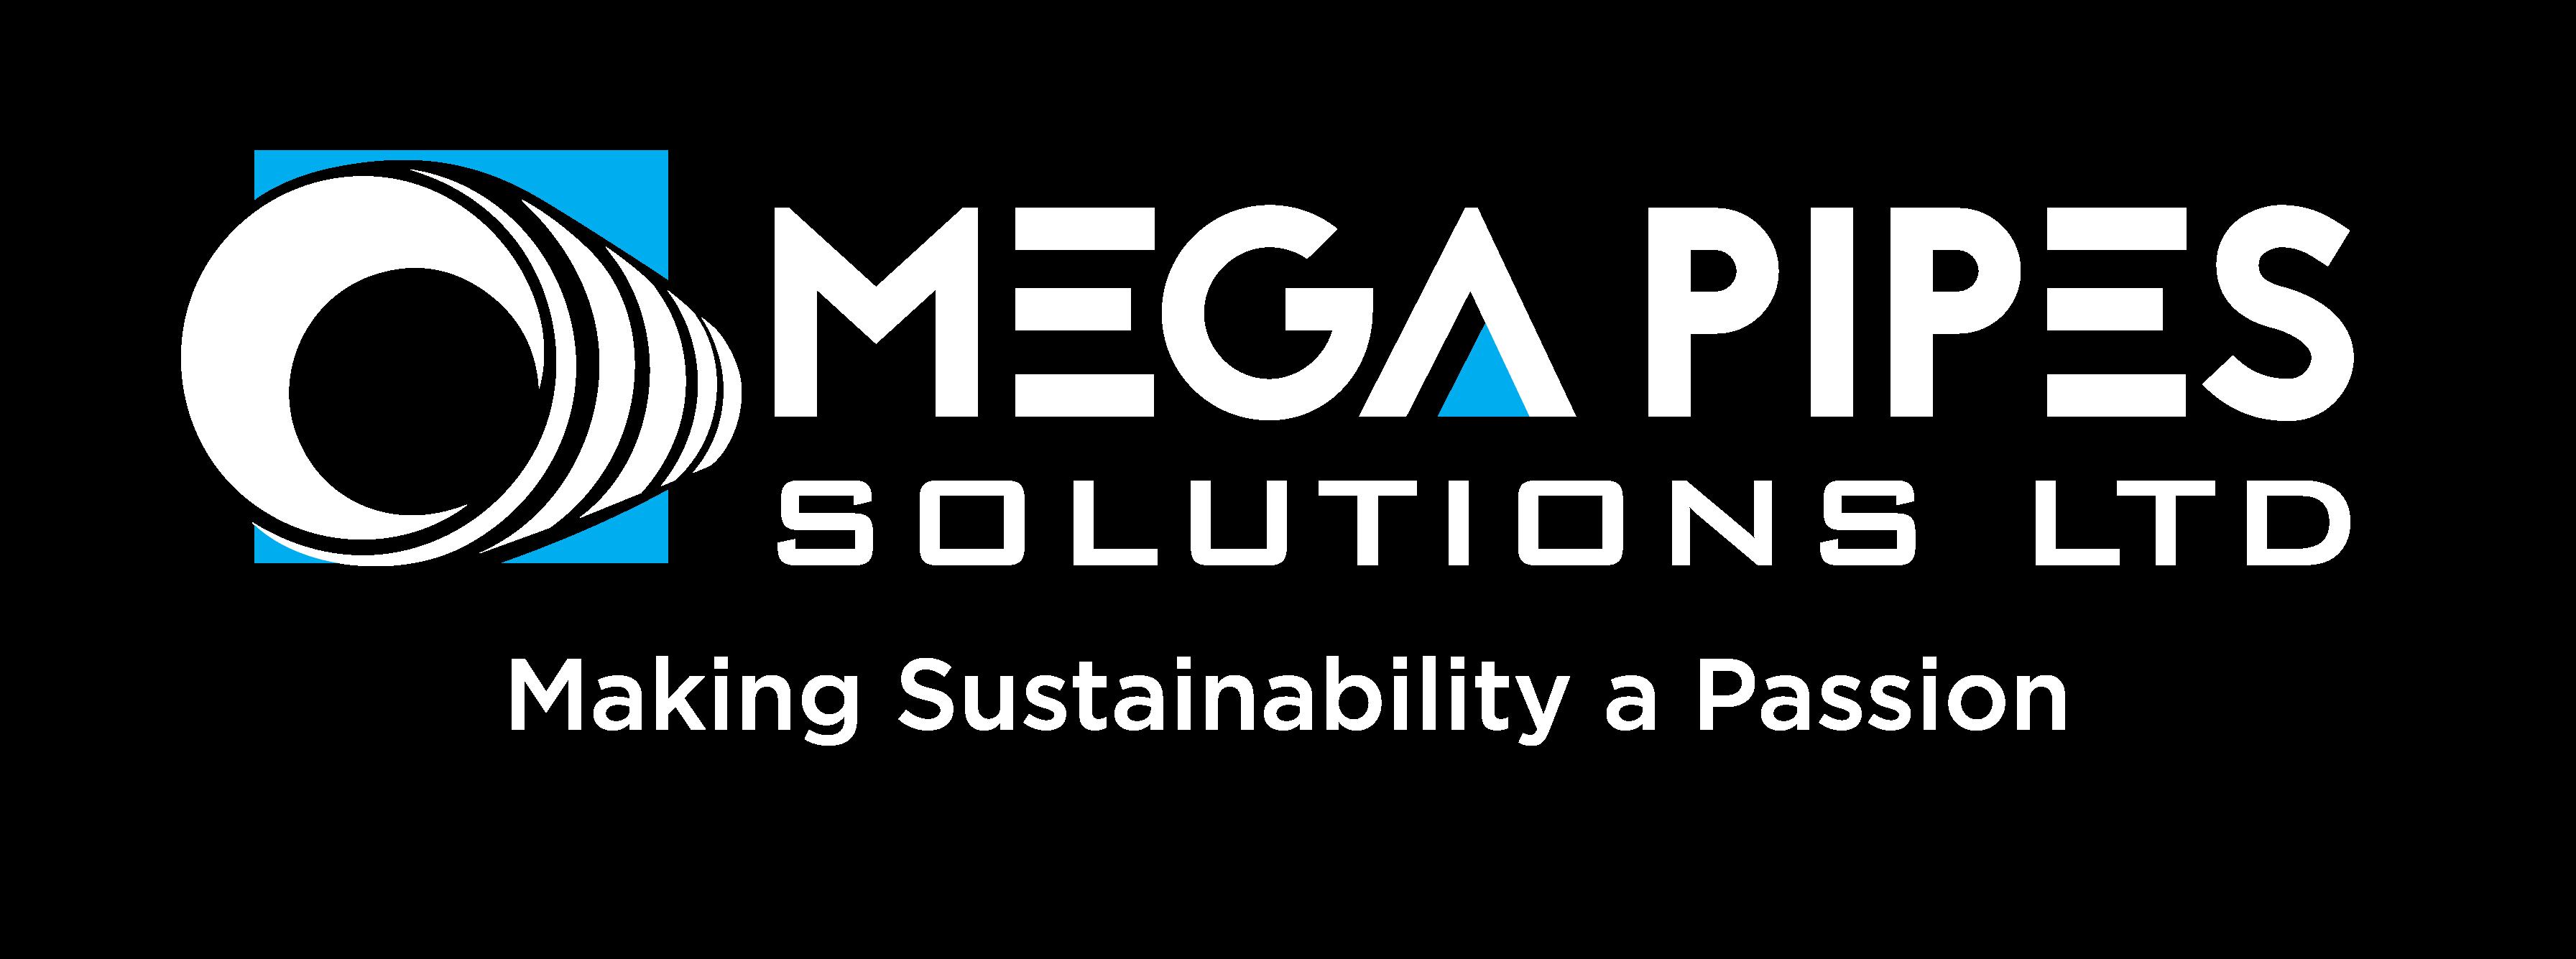 Megapipes Logo